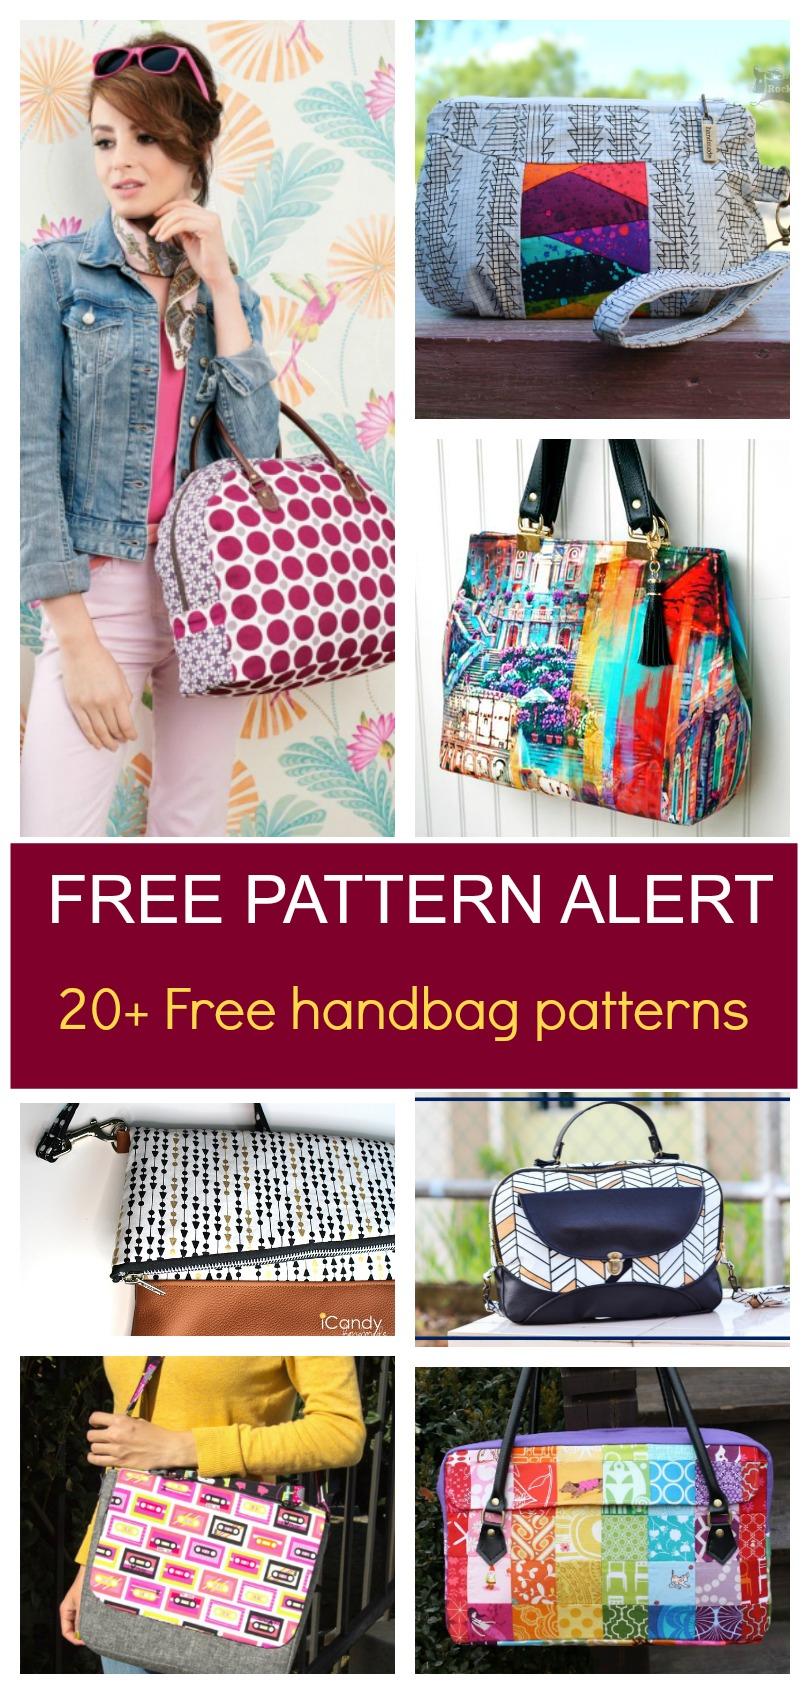 Free Pattern Alert: 20+ Handbag Sewing Patterns | On The Cutting - Free Printable Purse Patterns To Sew